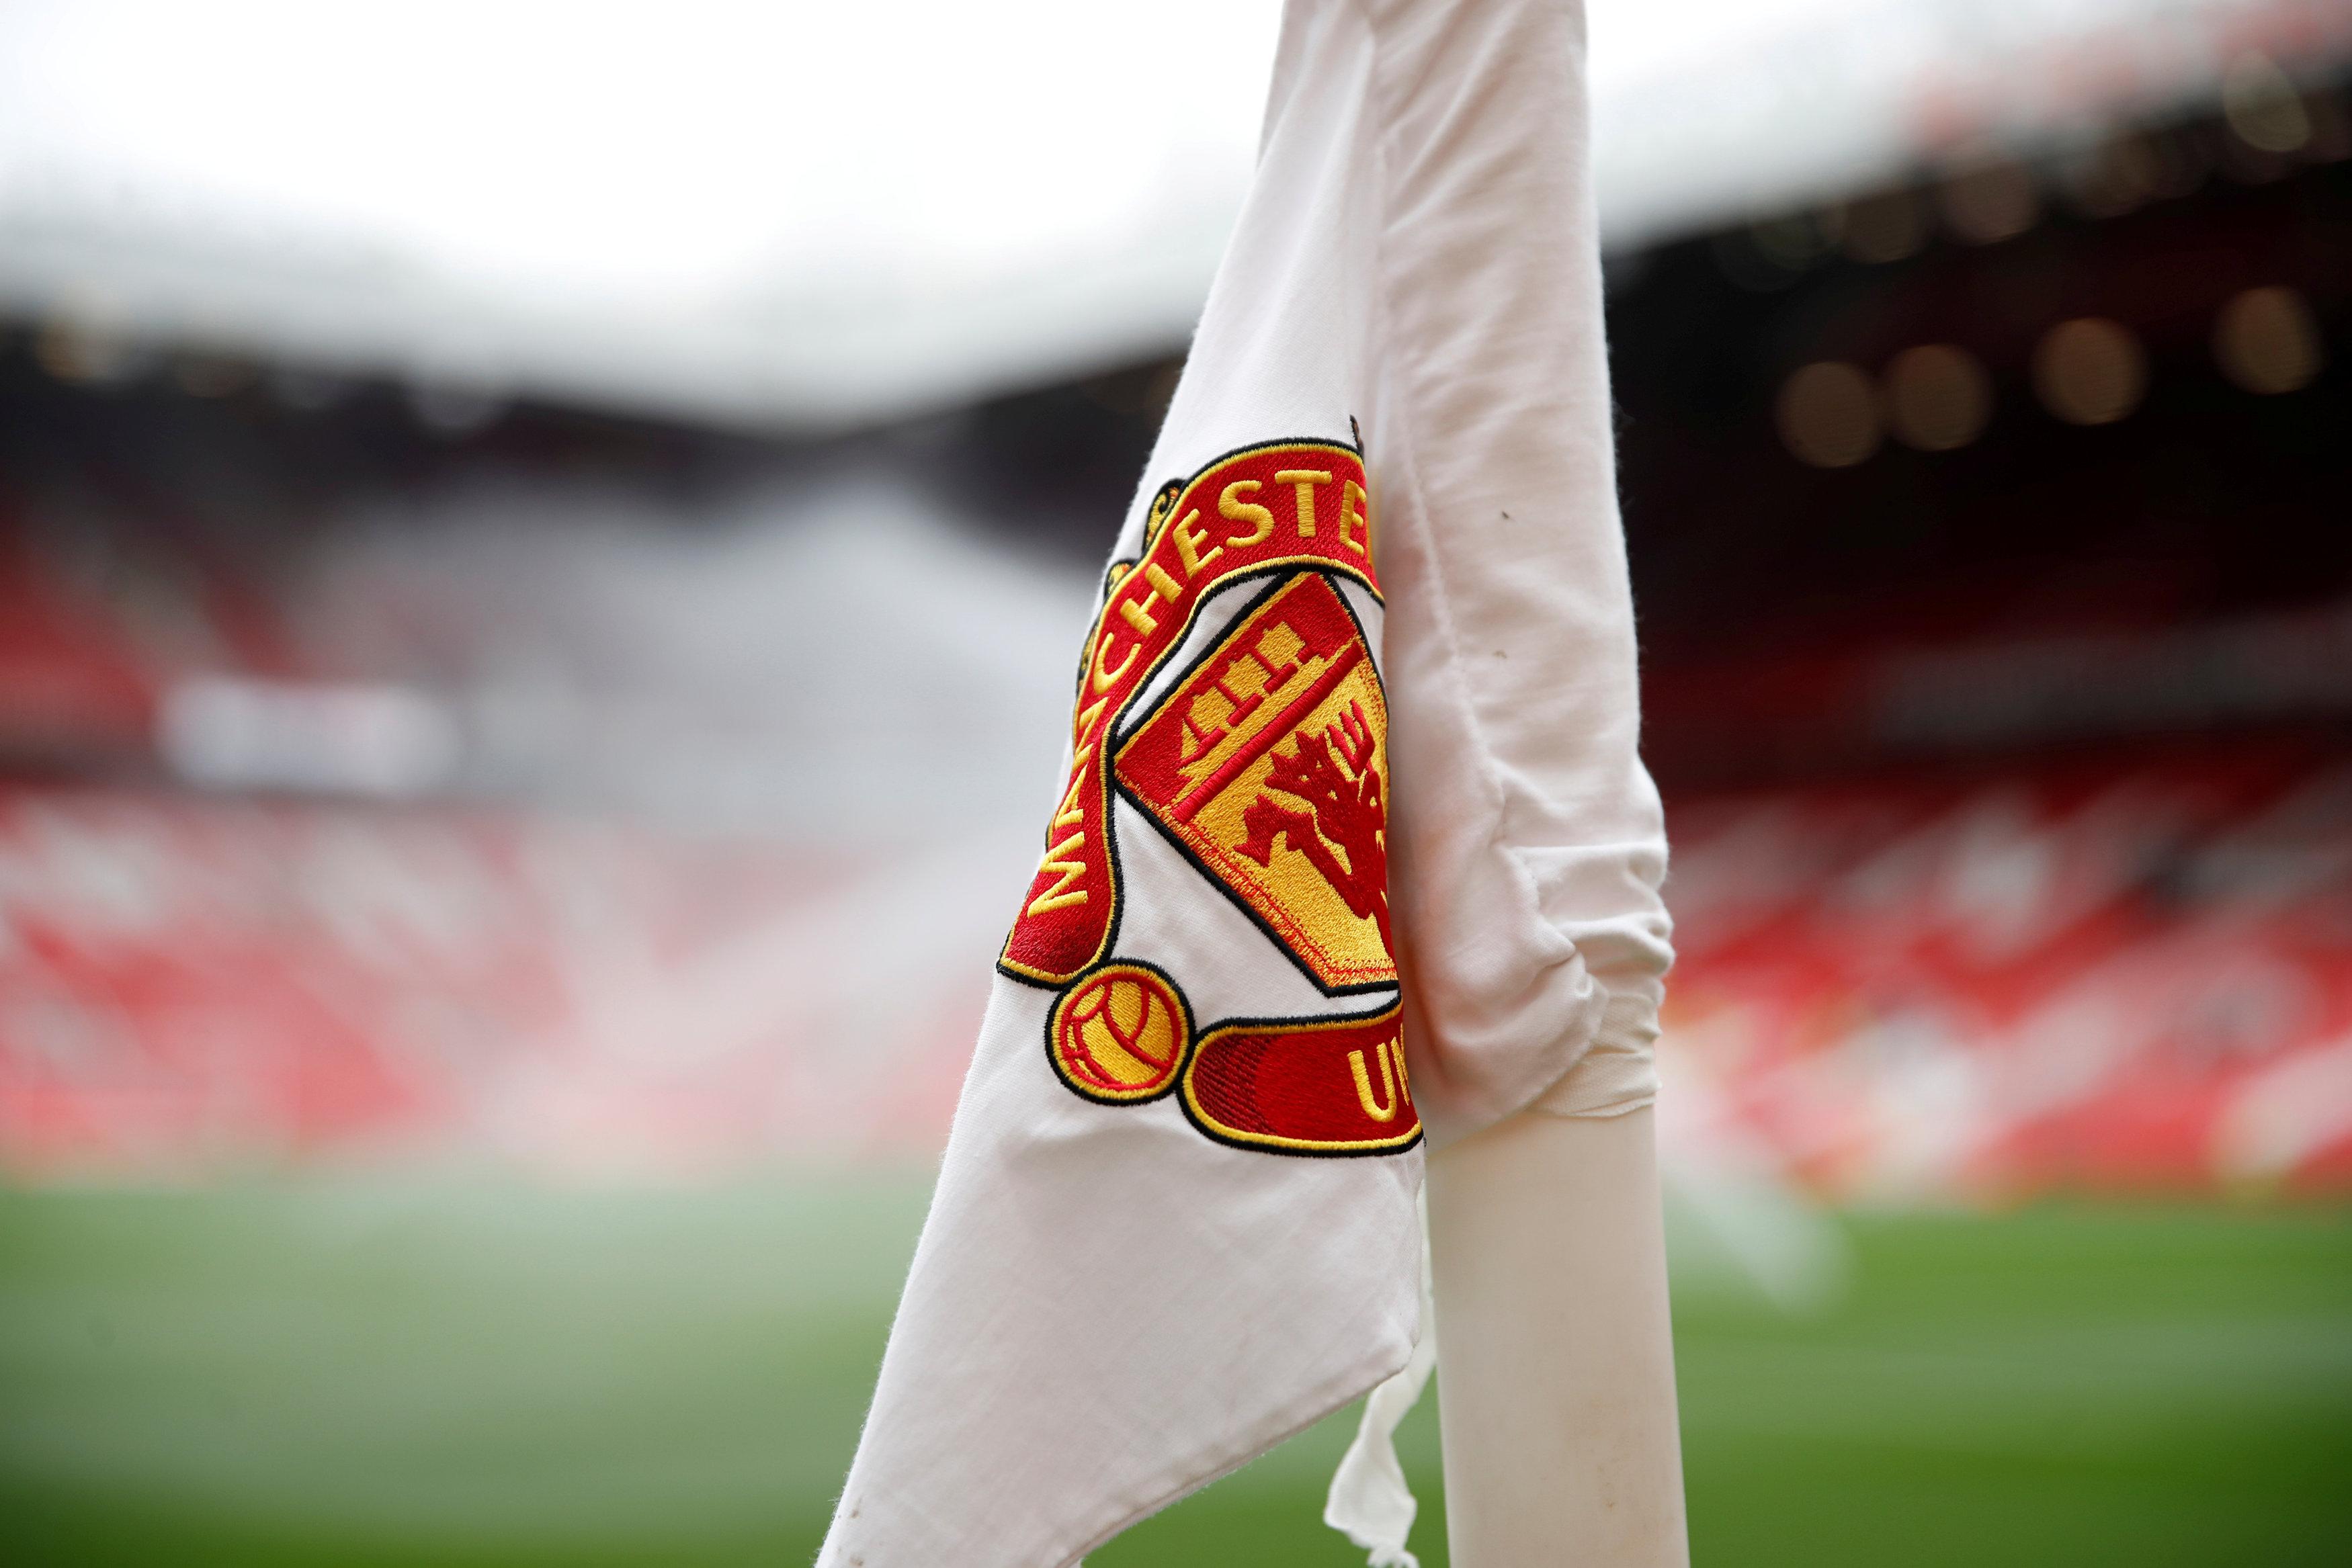 Manchester United Field Hd Football